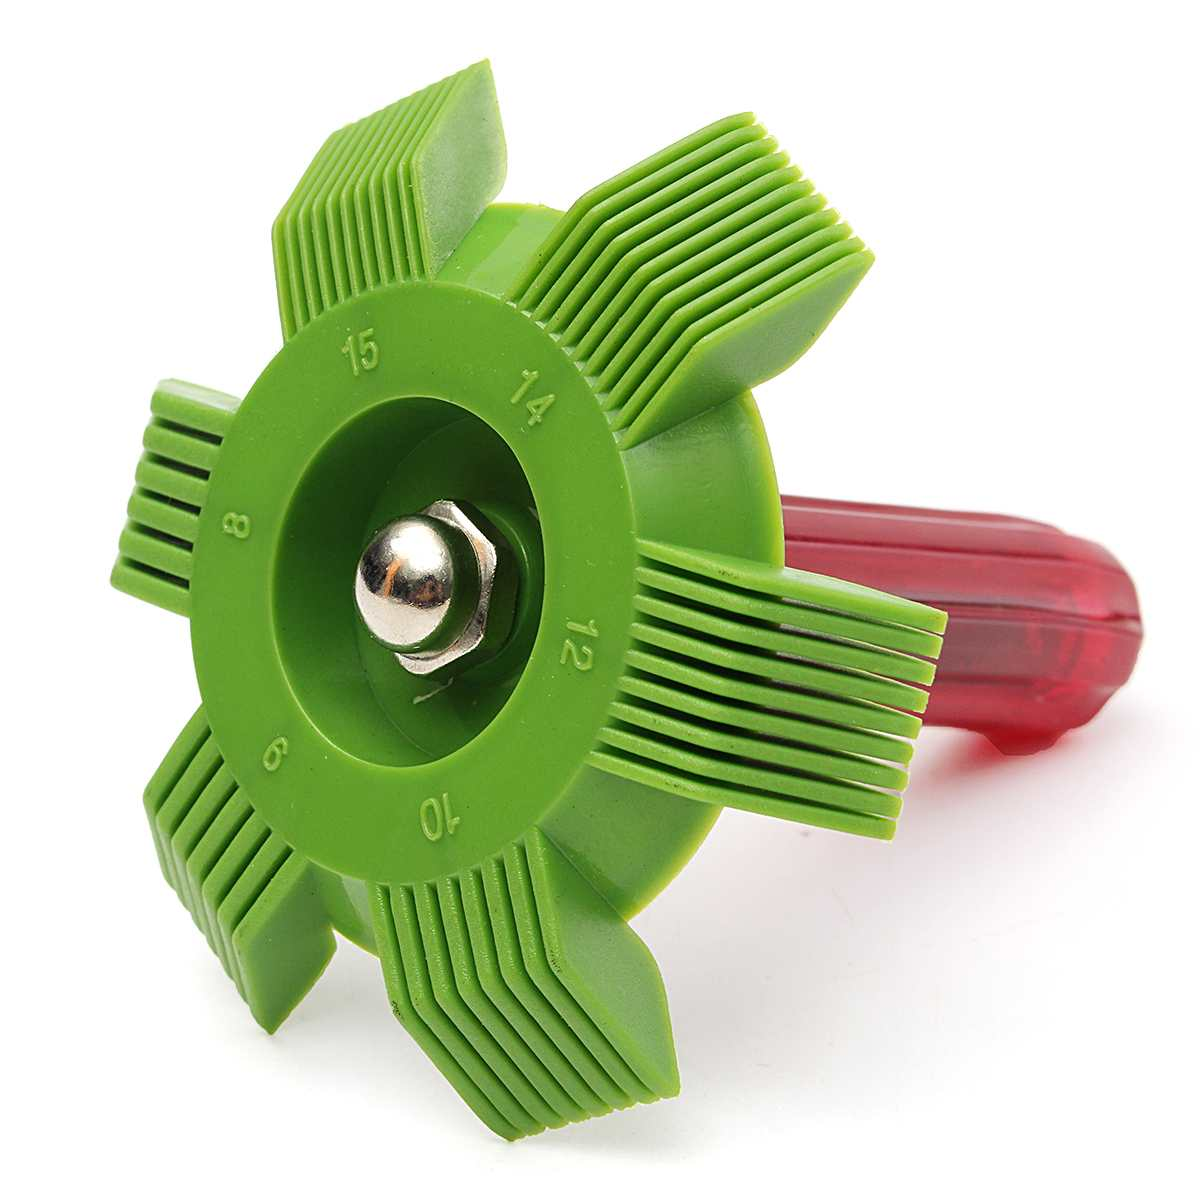 Car OEM Tools A//C Radiator Evaporator Fin Straightener Comb Rake 8,9,10,12,14,15